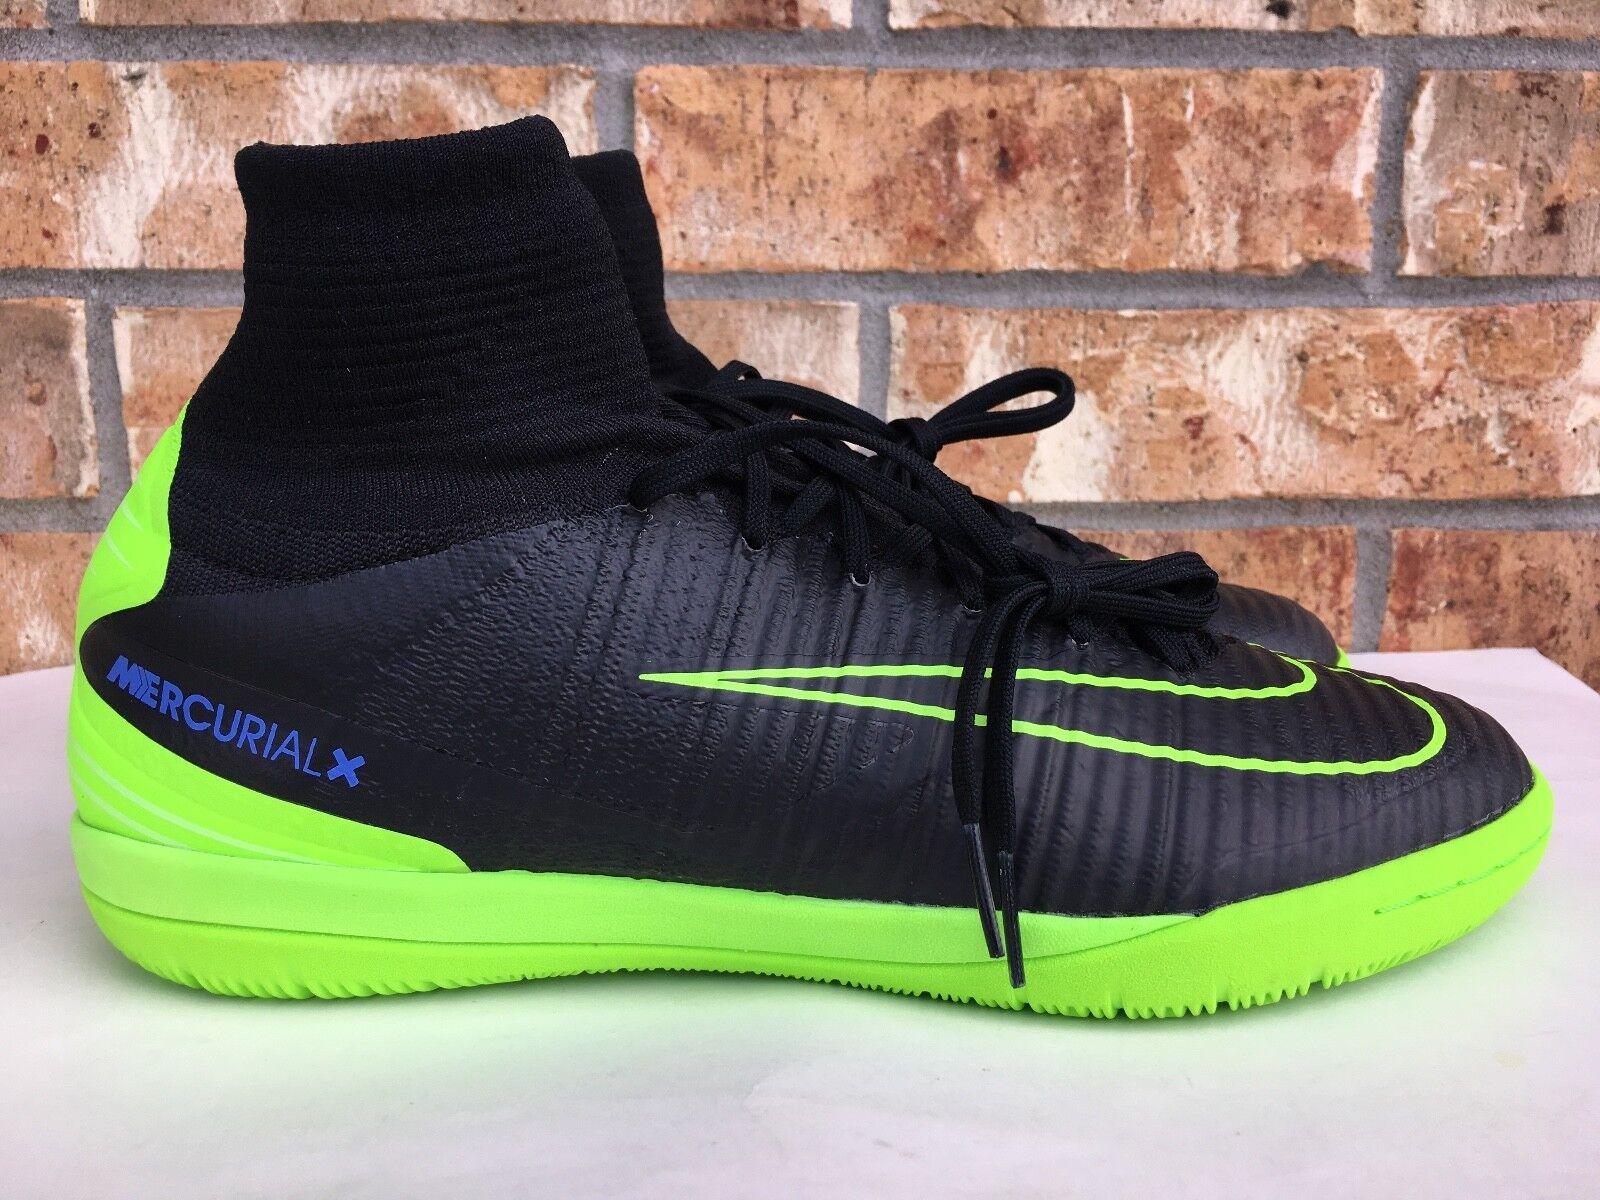 Men's Nike MercurialX Proximo II IC Indoor Soccer Soccer Soccer shoes Black Size 9 831976-034 58fecc